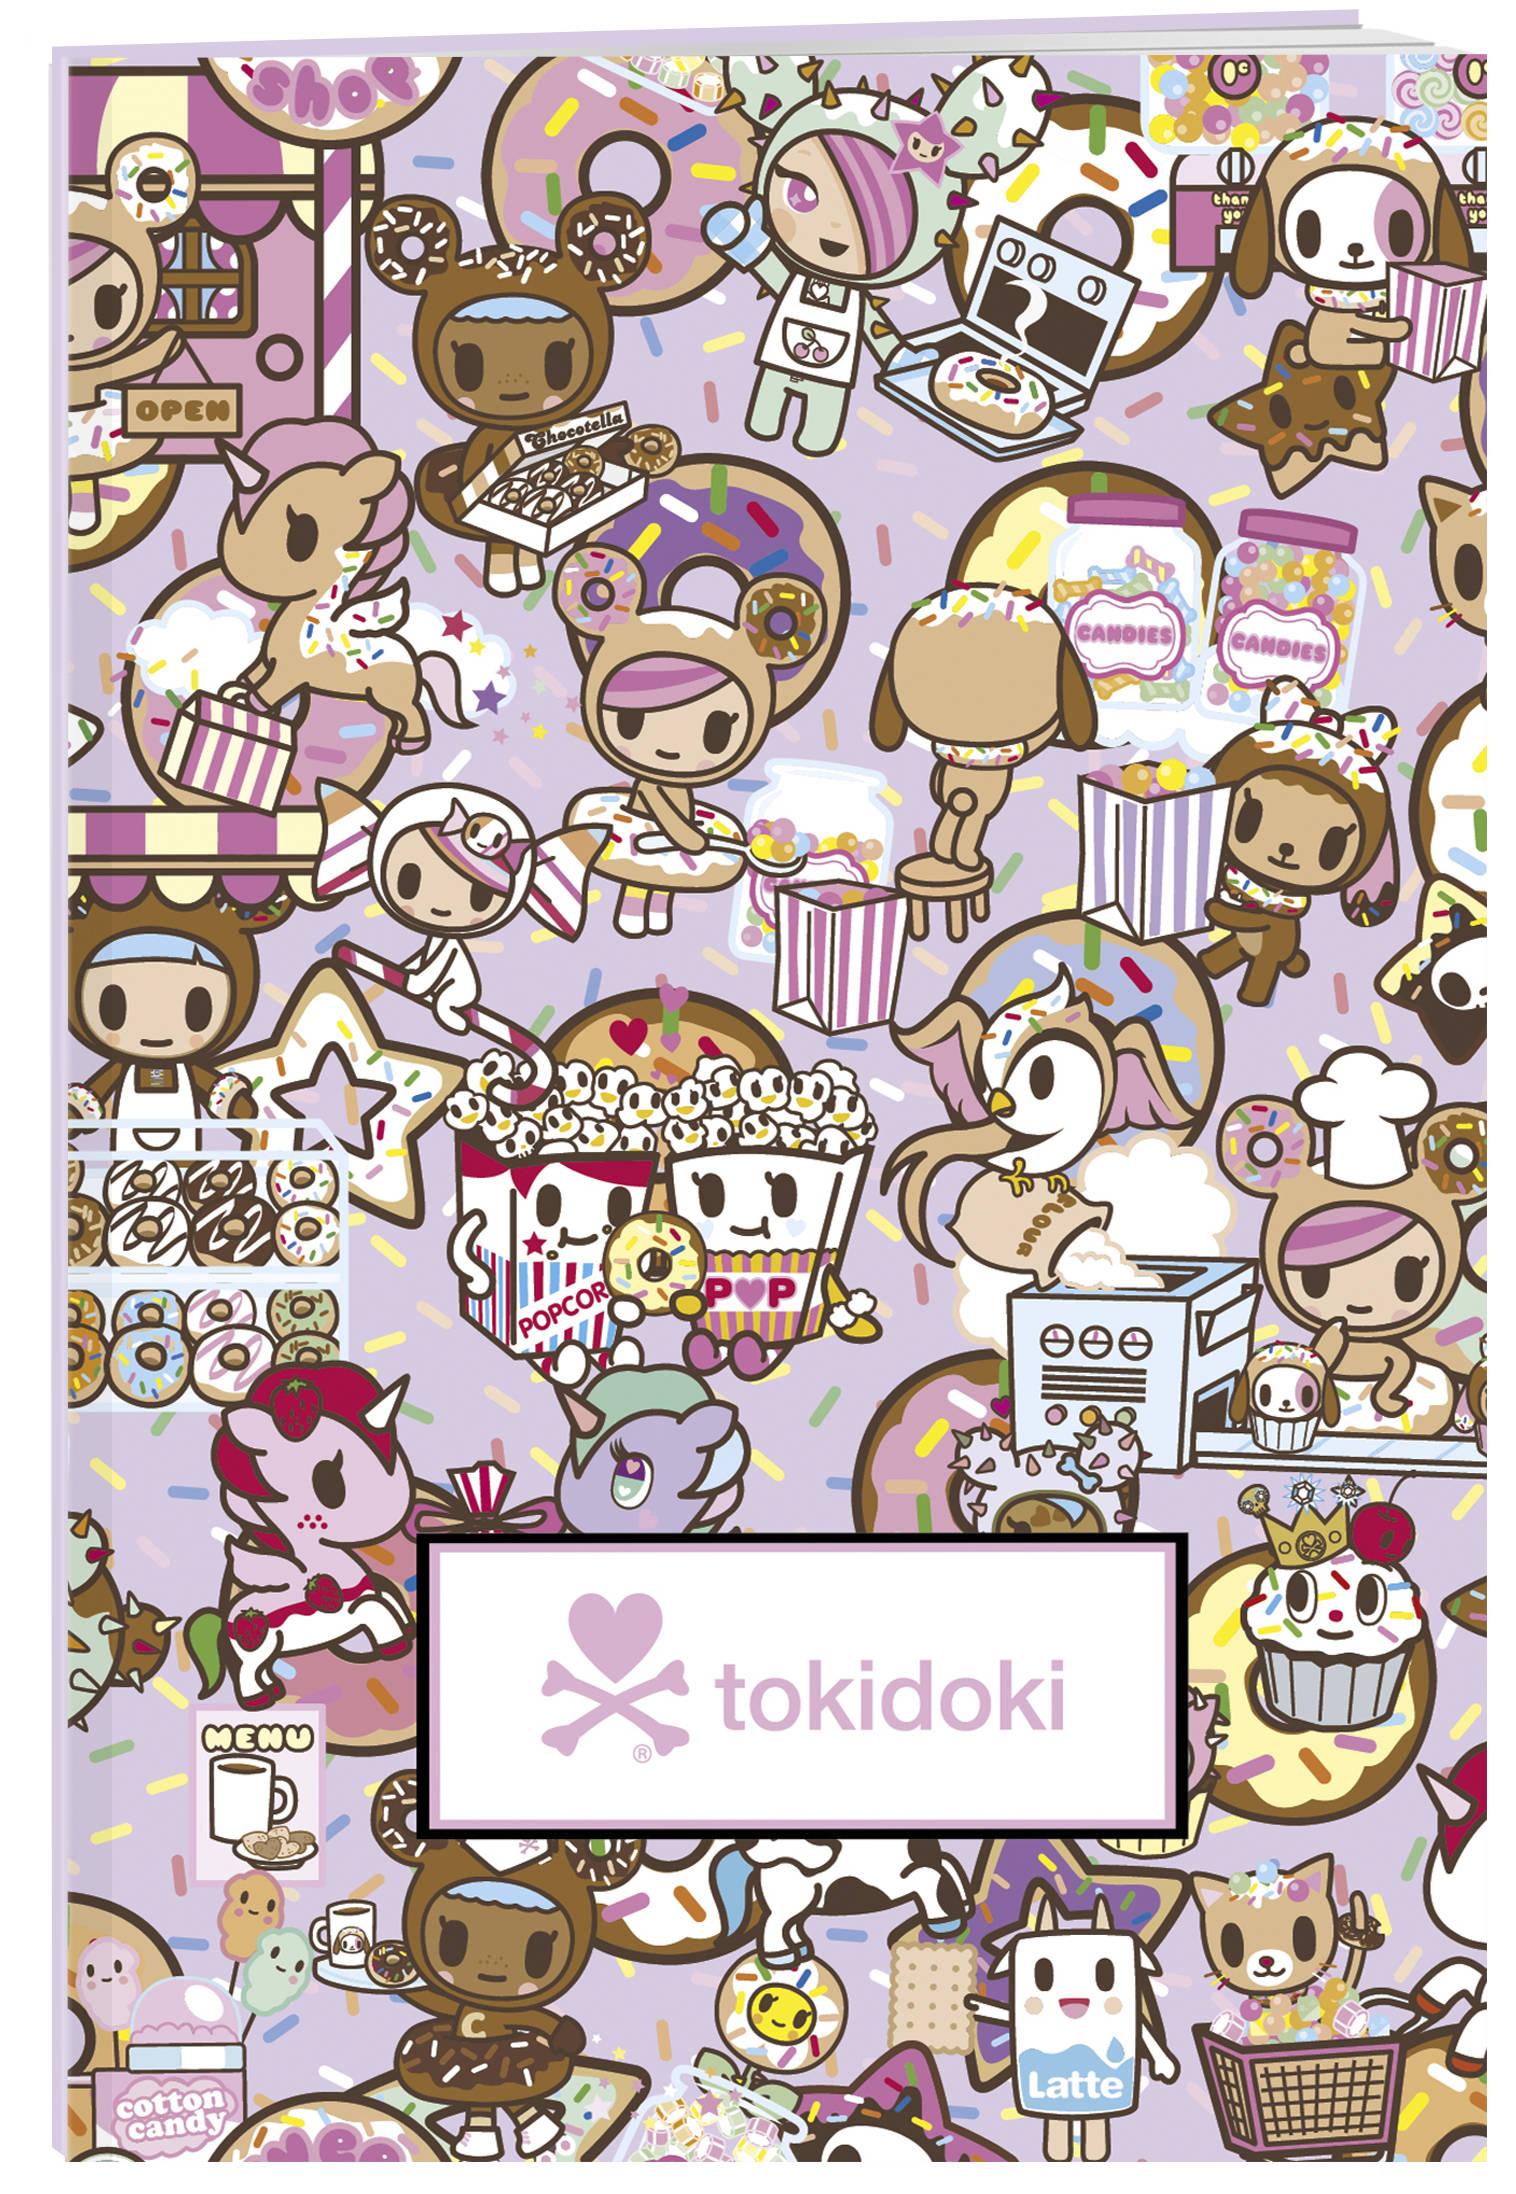 tokidoki. Пончики. Тетрадь (А5, 48 л., УФ-лак, накидки)